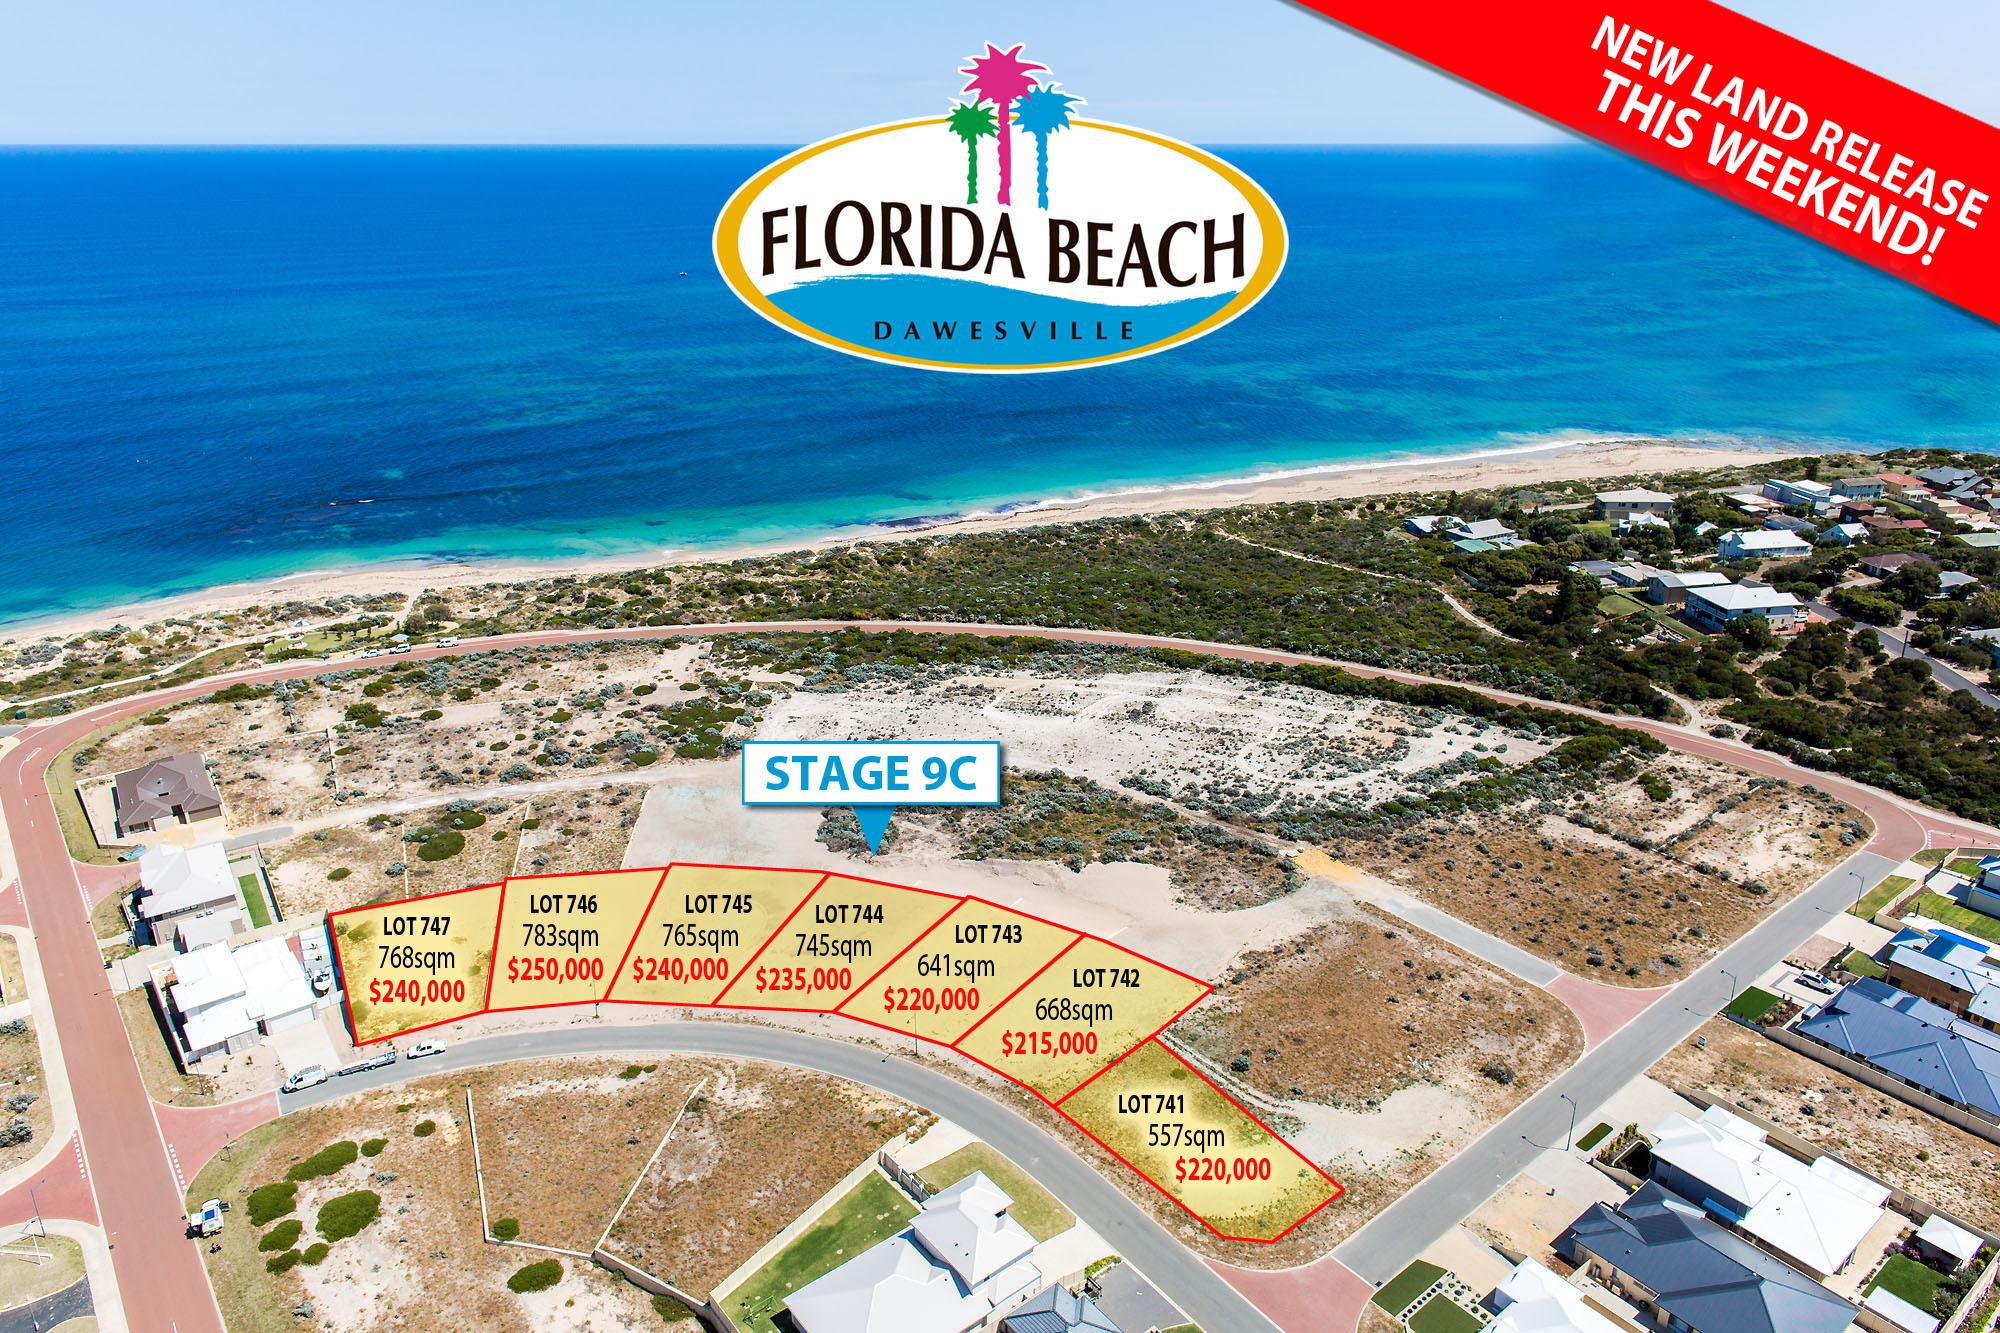 Land For Sale Florida Beach Dawesville